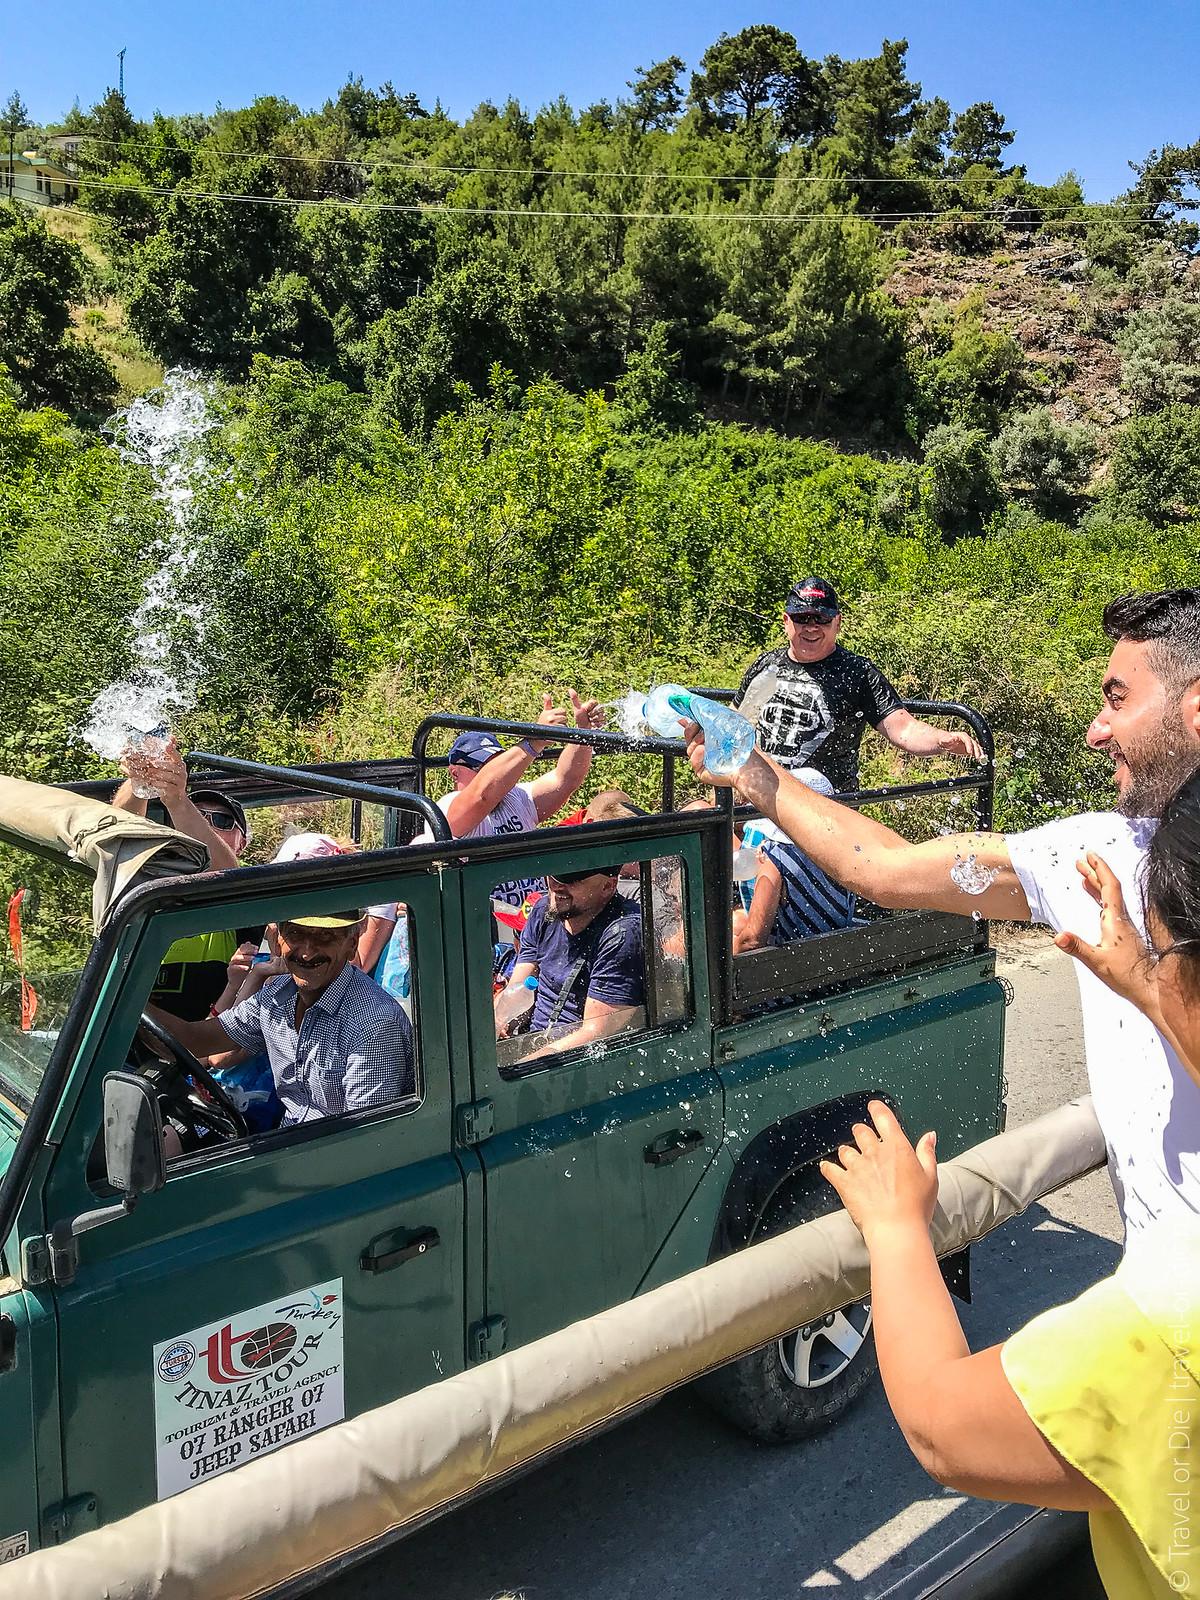 Sapadere-Canyon-Tour-экскурсия-в-каньон-сападере-8425